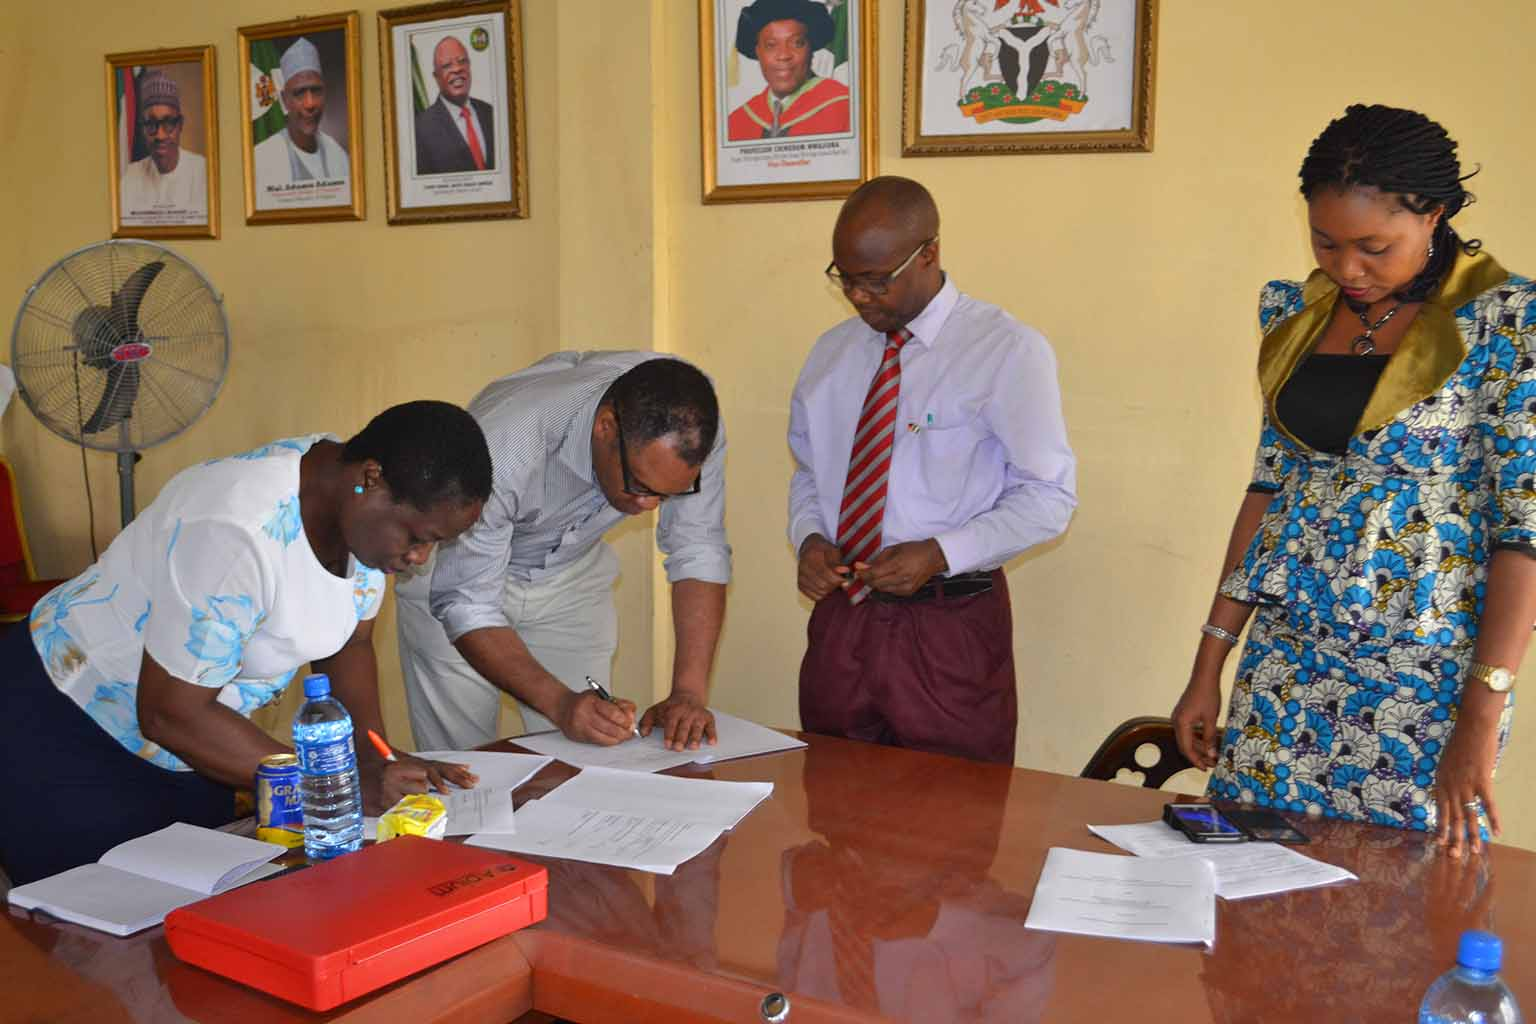 Signing of Memorandum of Understanding between the University and Prof Brando Okolo. Left to right Prof G.M.T Emezue, Prof Brando Okolo, Prof Jonny Ogunji (the Director of Academic Programme) and Barrister Ogochukwu (Head of the University Legal Unit)